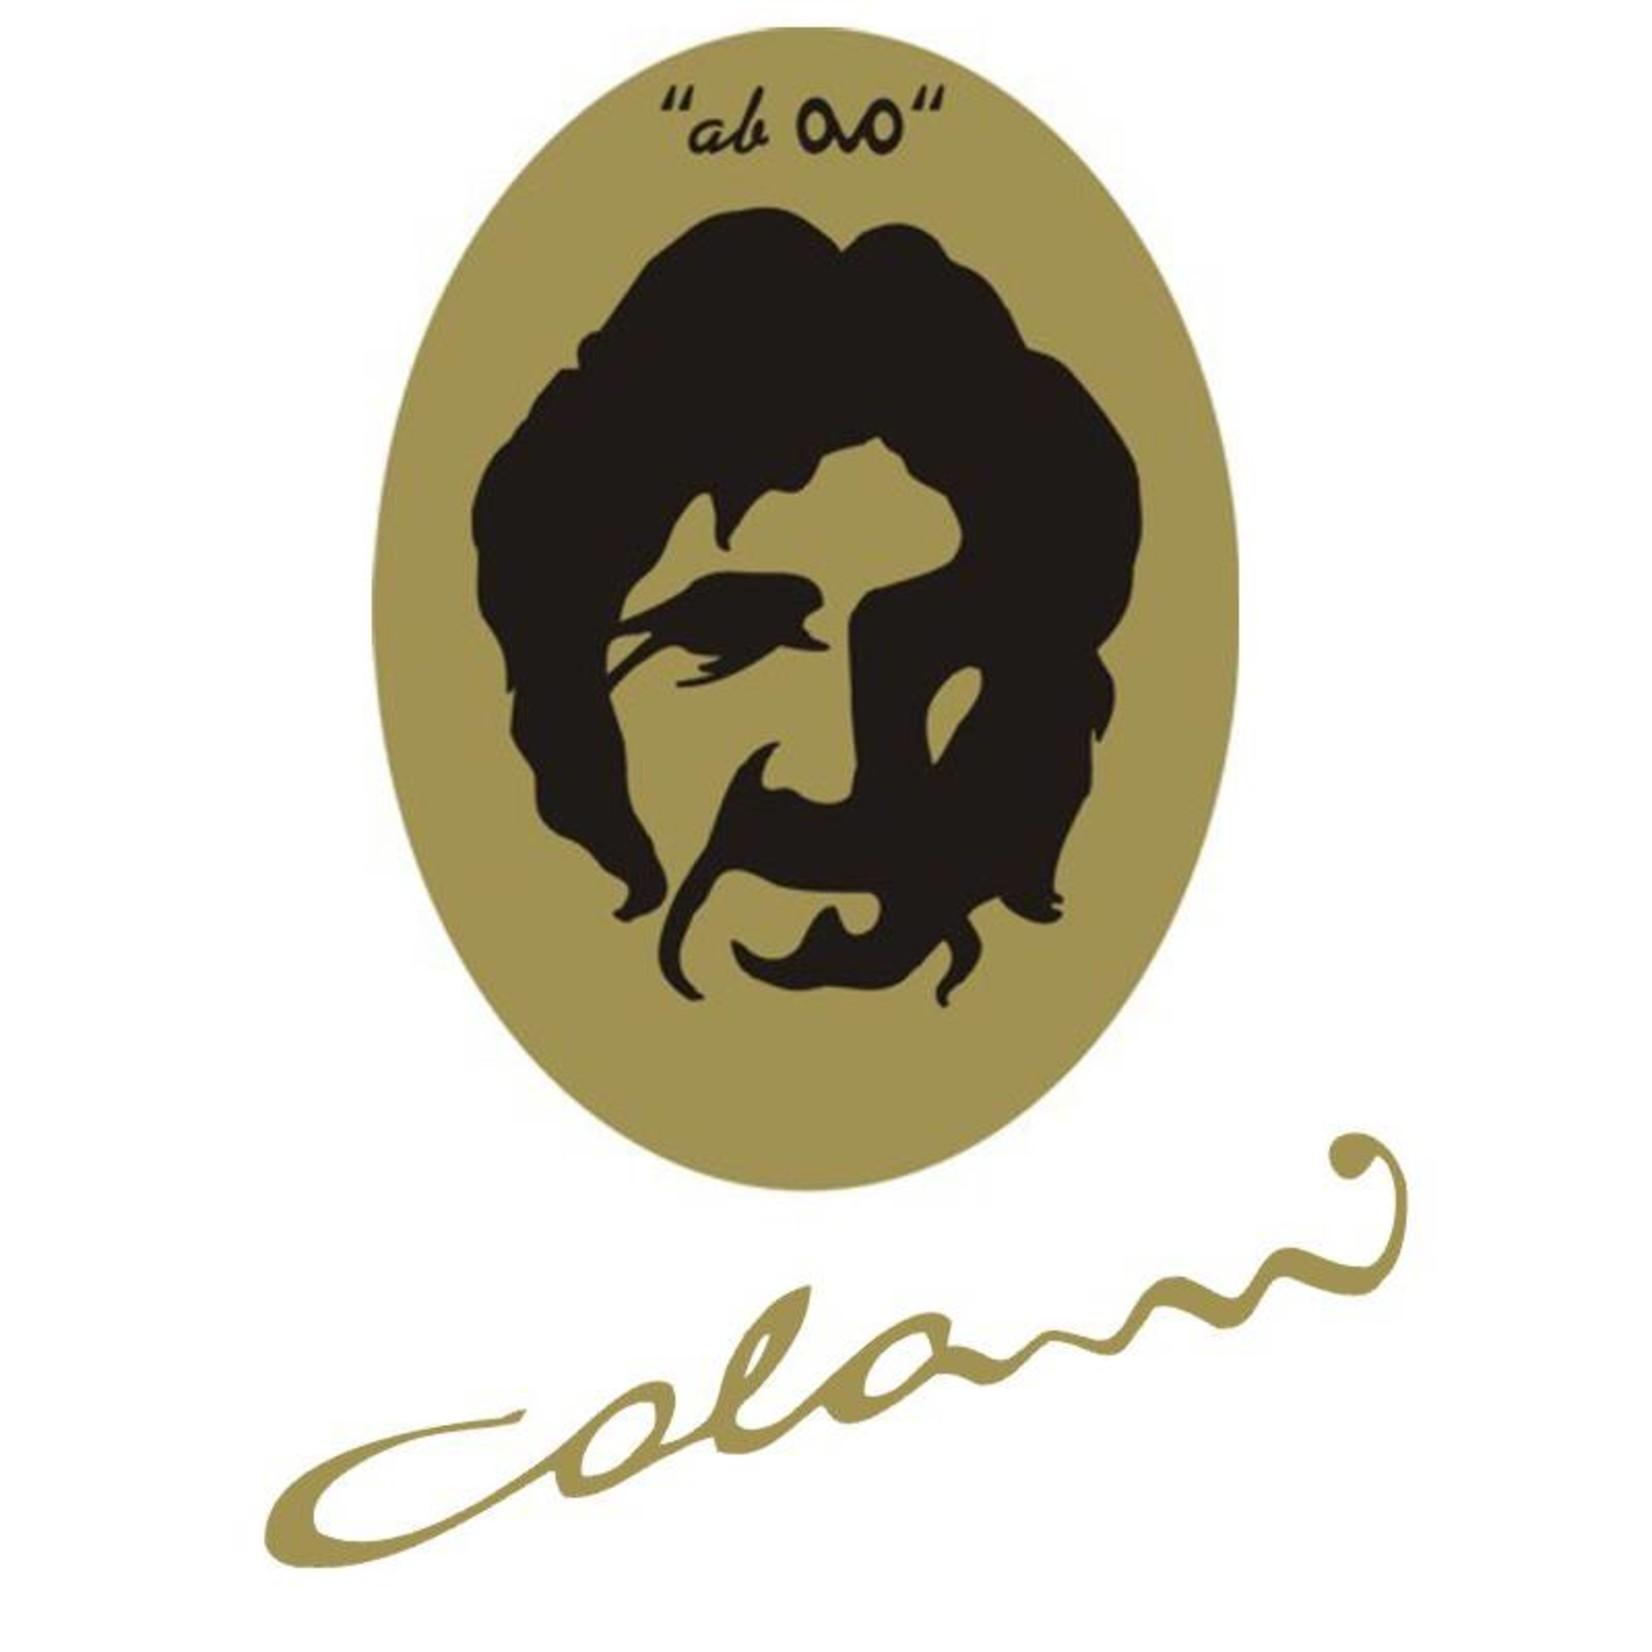 Colani Porzellanserie Colani Jumbotasse aus Porzellan in Schwarz, 2- teilig